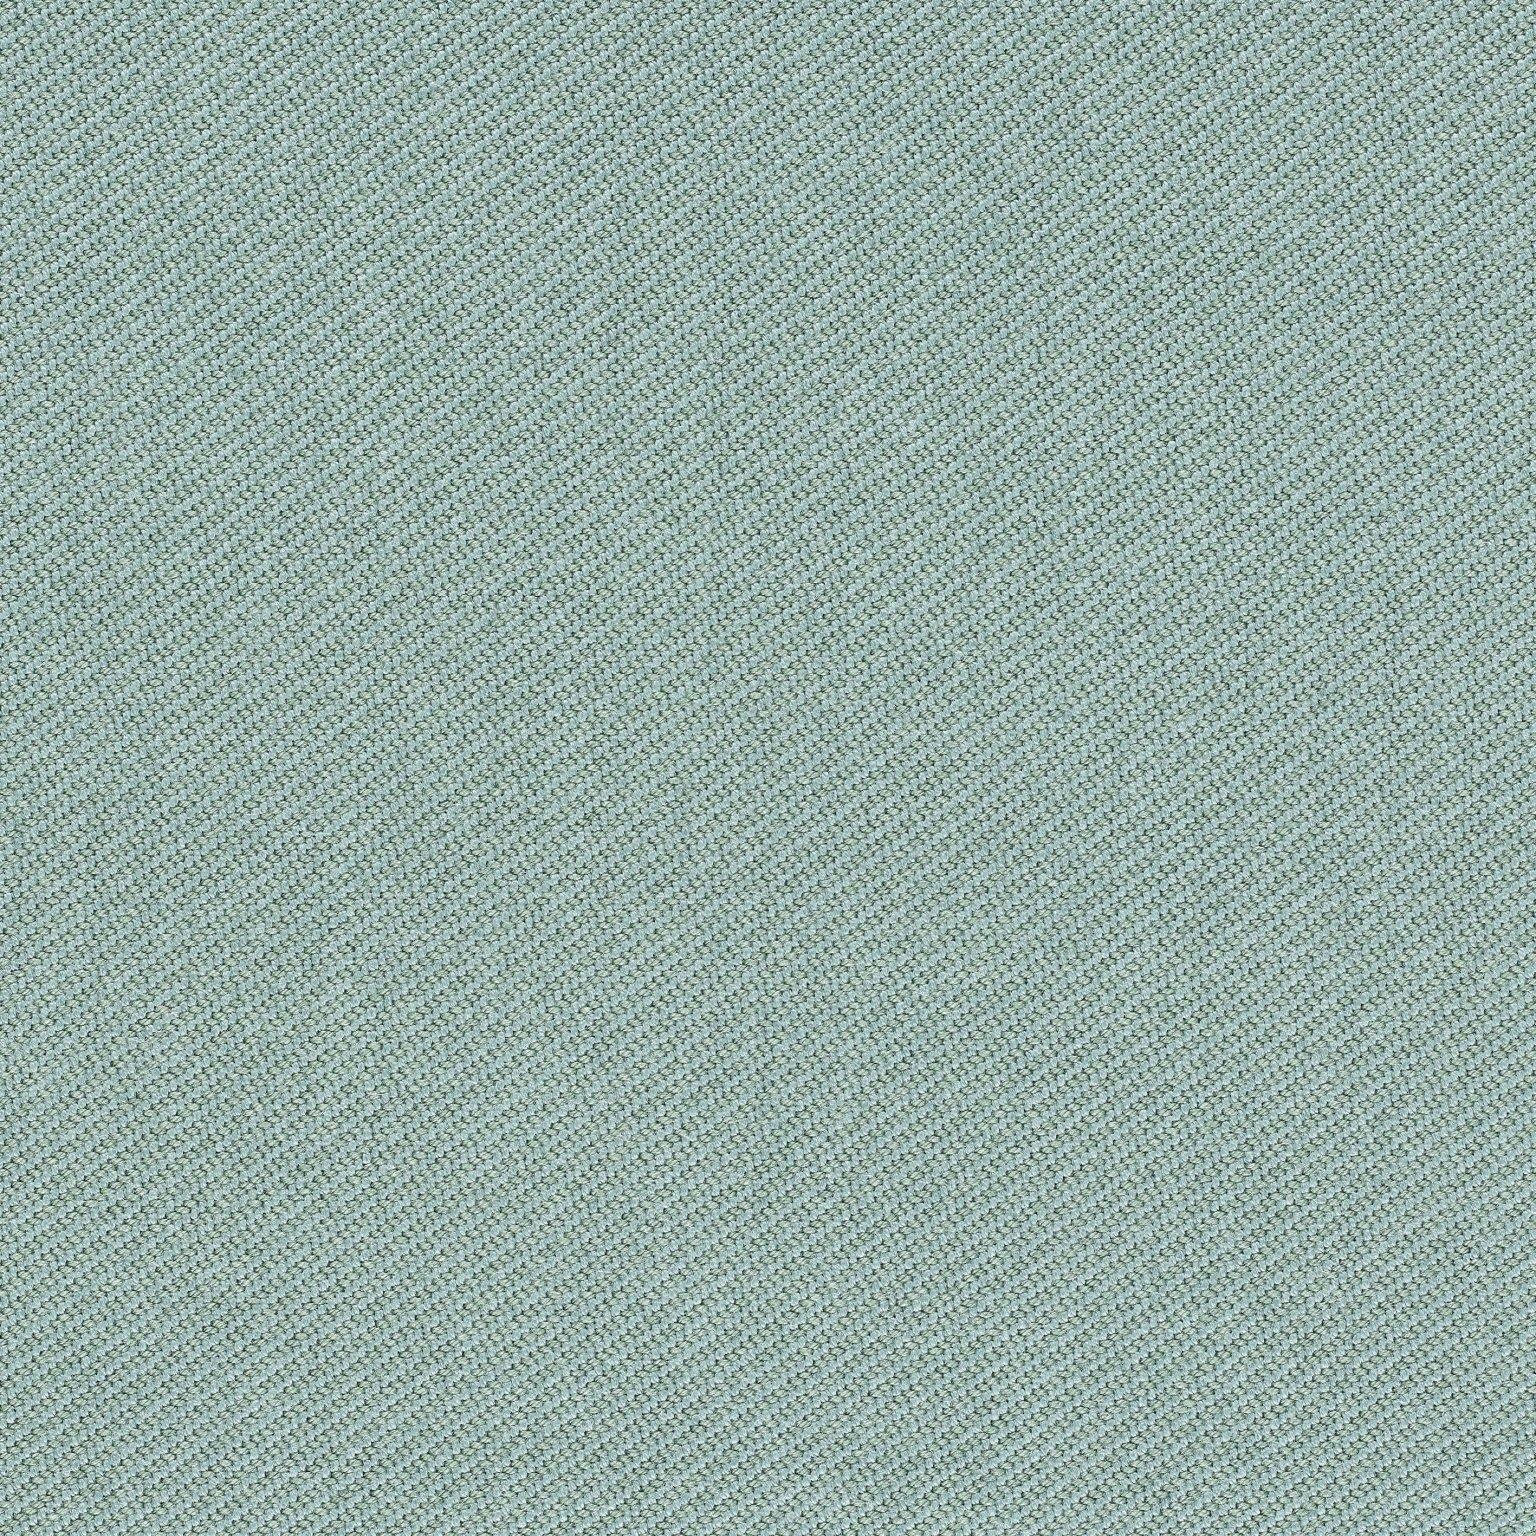 Kvadrat > Twill Weave 0940